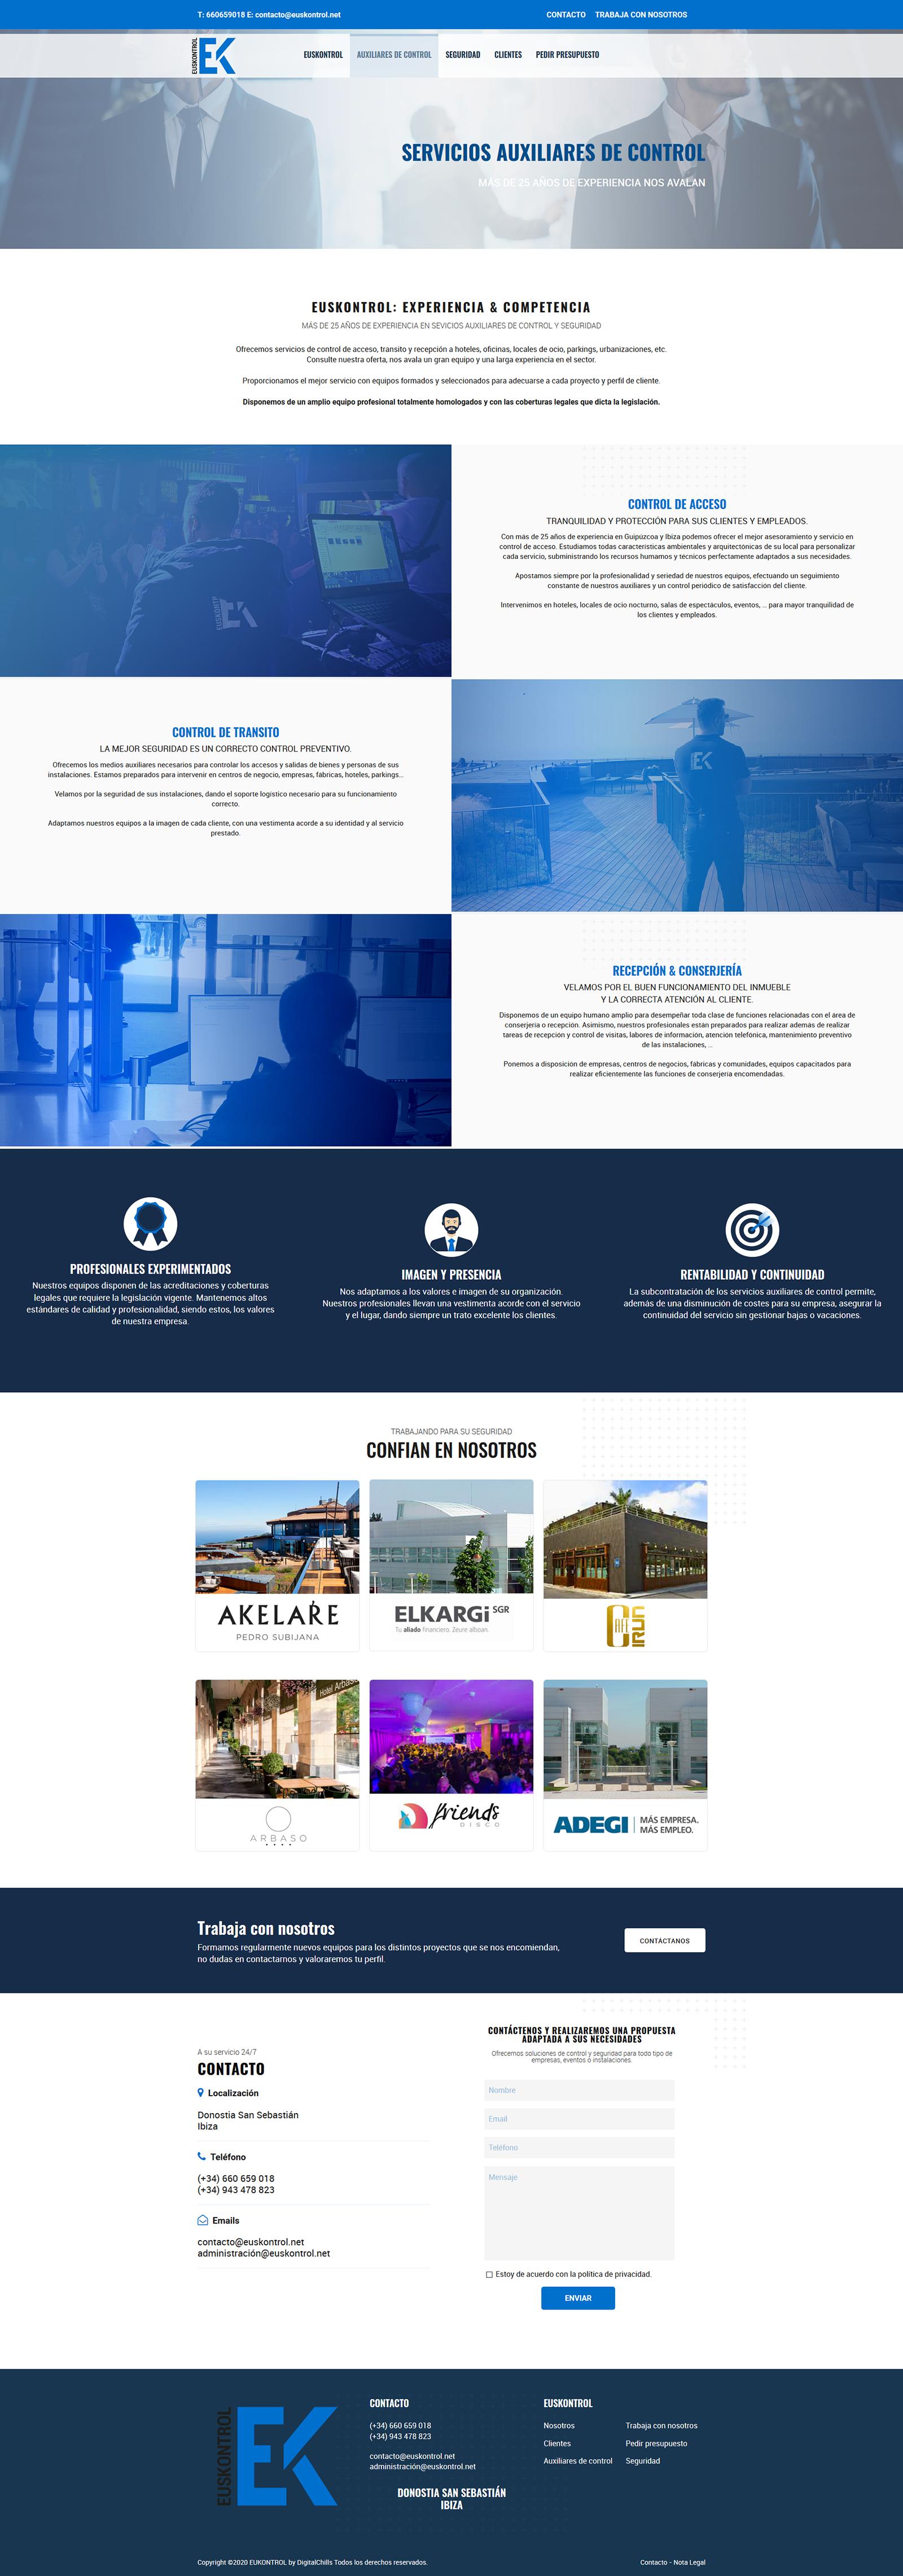 website Euskontrol | DIGITAL CHILLS Diseño & Marketing Digital